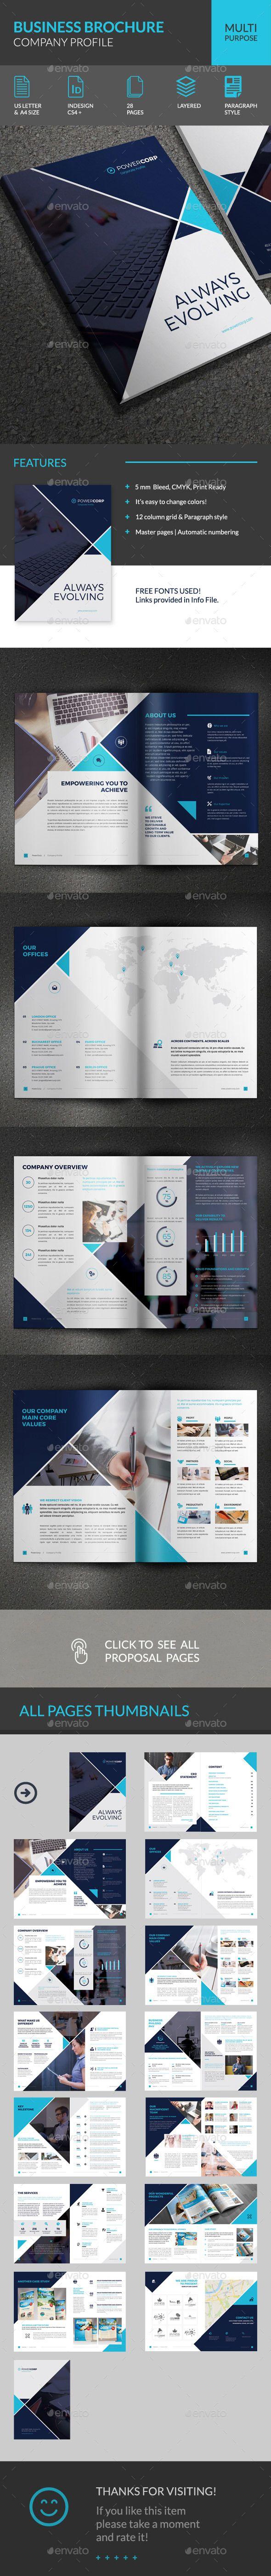 Powercorp Business Brochure - Corporate Profile - Corporate - Free Printable Brochure Templates